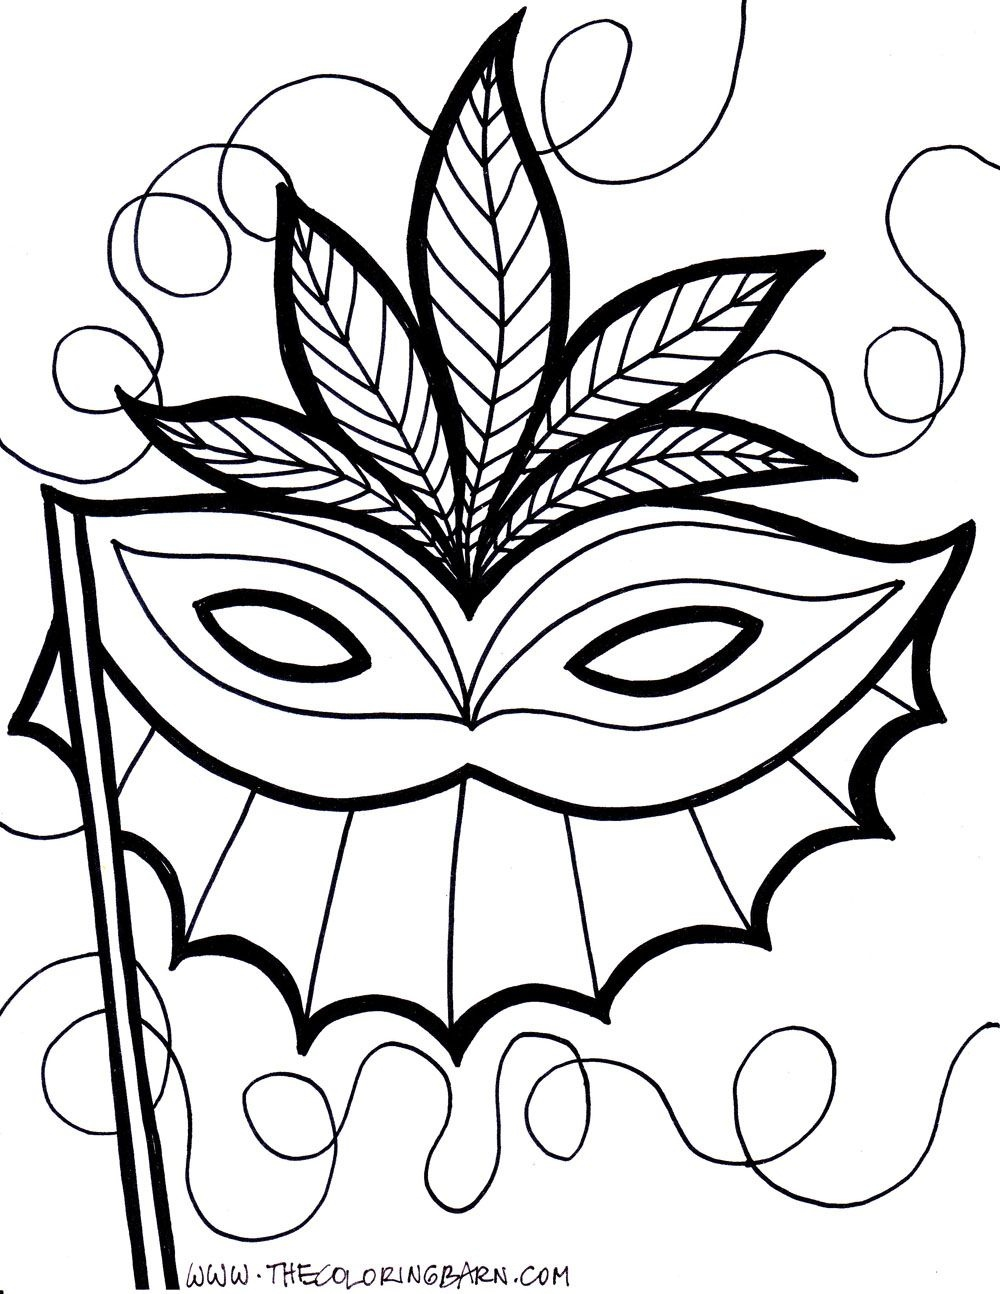 Pinelyssanda Desertsong On Embroidery Inspiration   Coloring - Free Printable Mardi Gras Masks